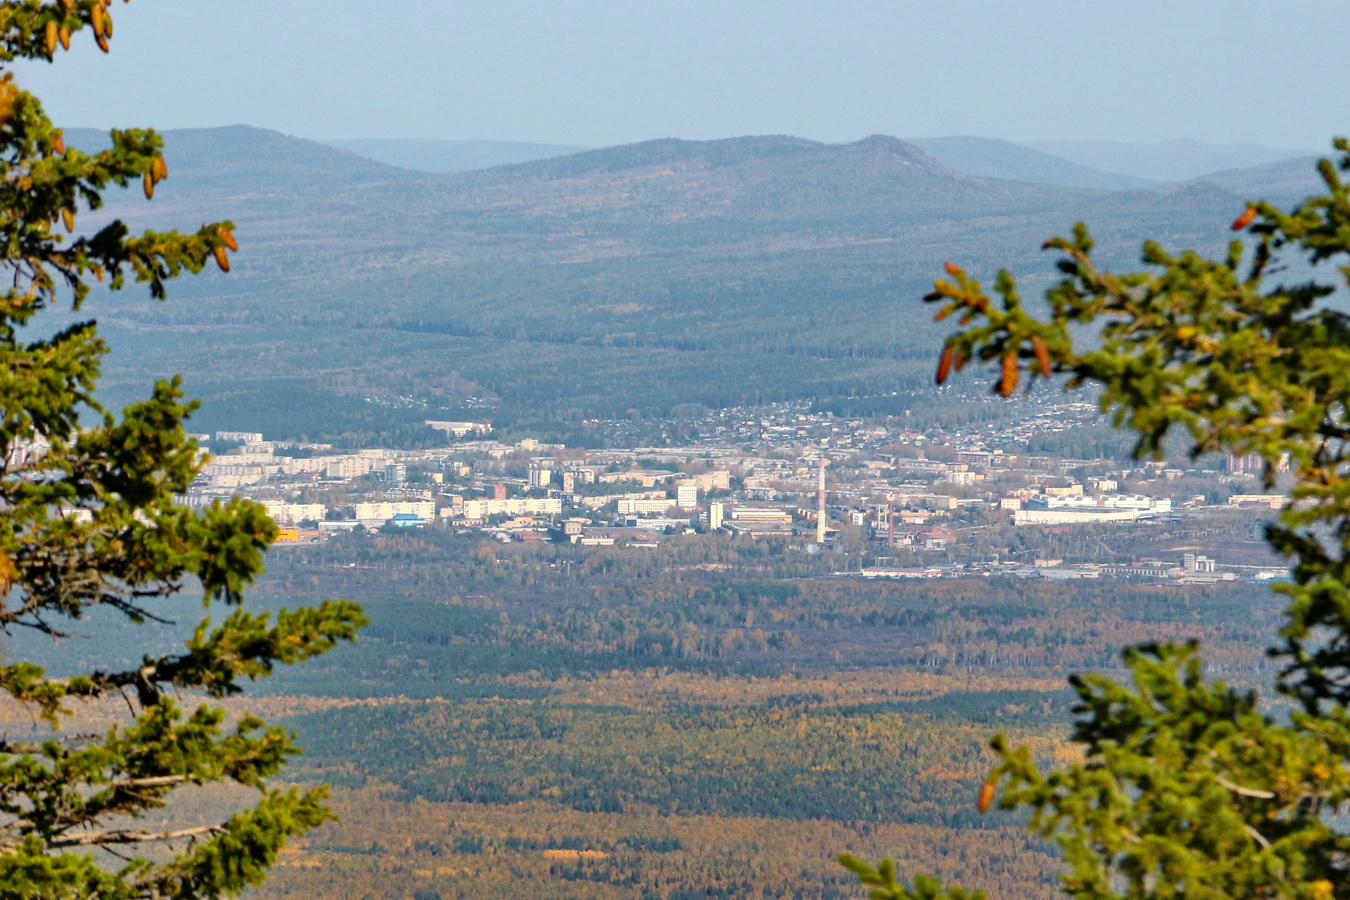 18. Вид на город Златоуст с хребта Уреньга. Canon 650D KIT 18-135. 1/800, 0,33, 800, 11.